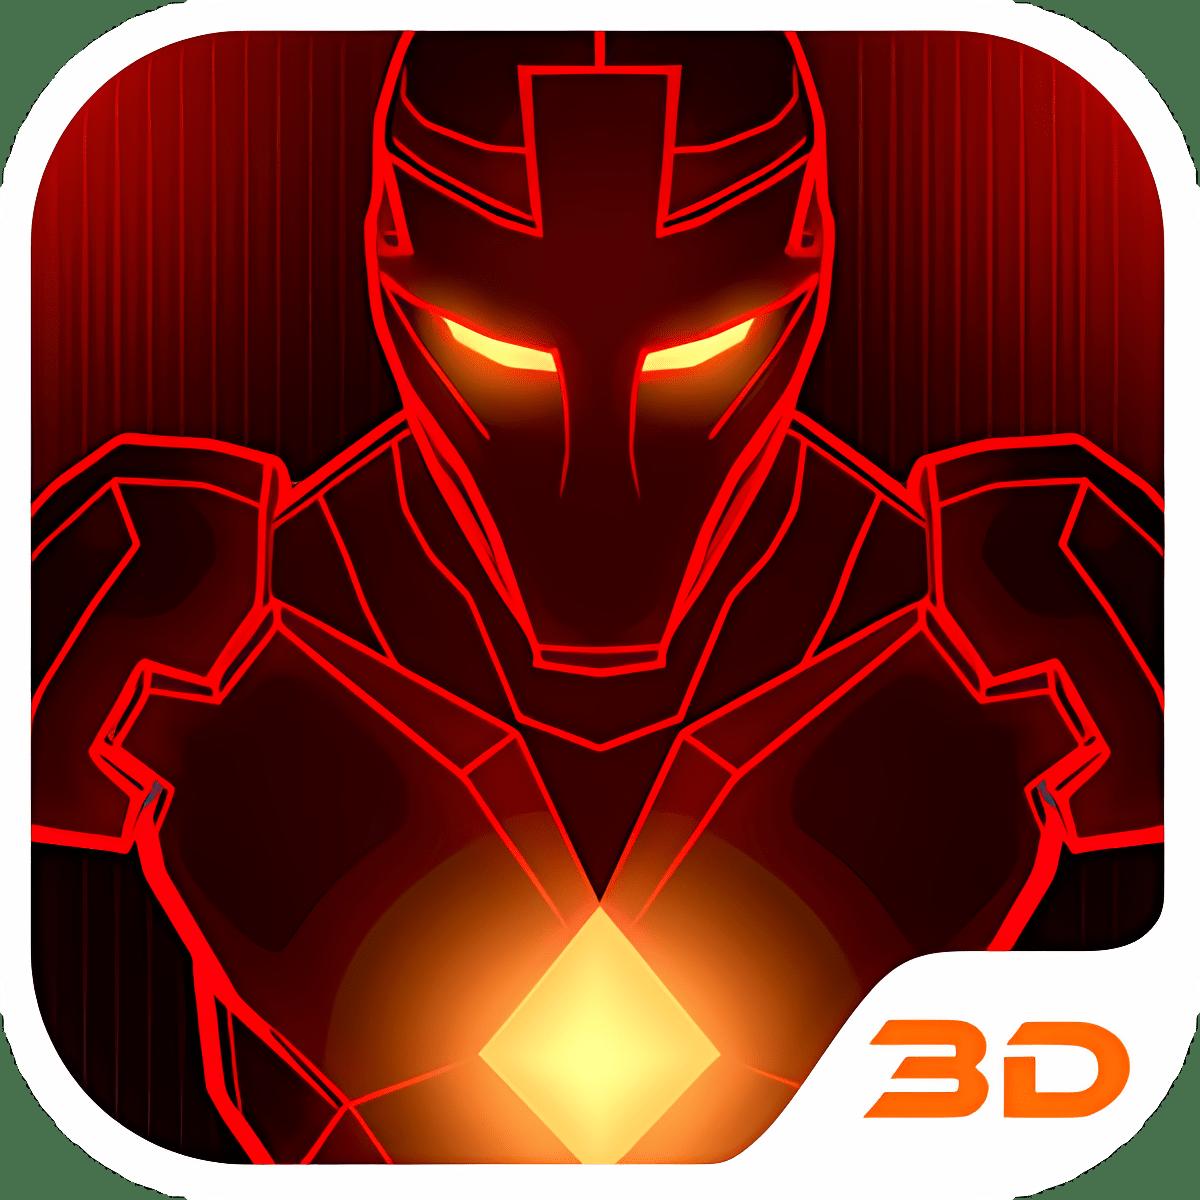 Red Iron Hero 3D Theme